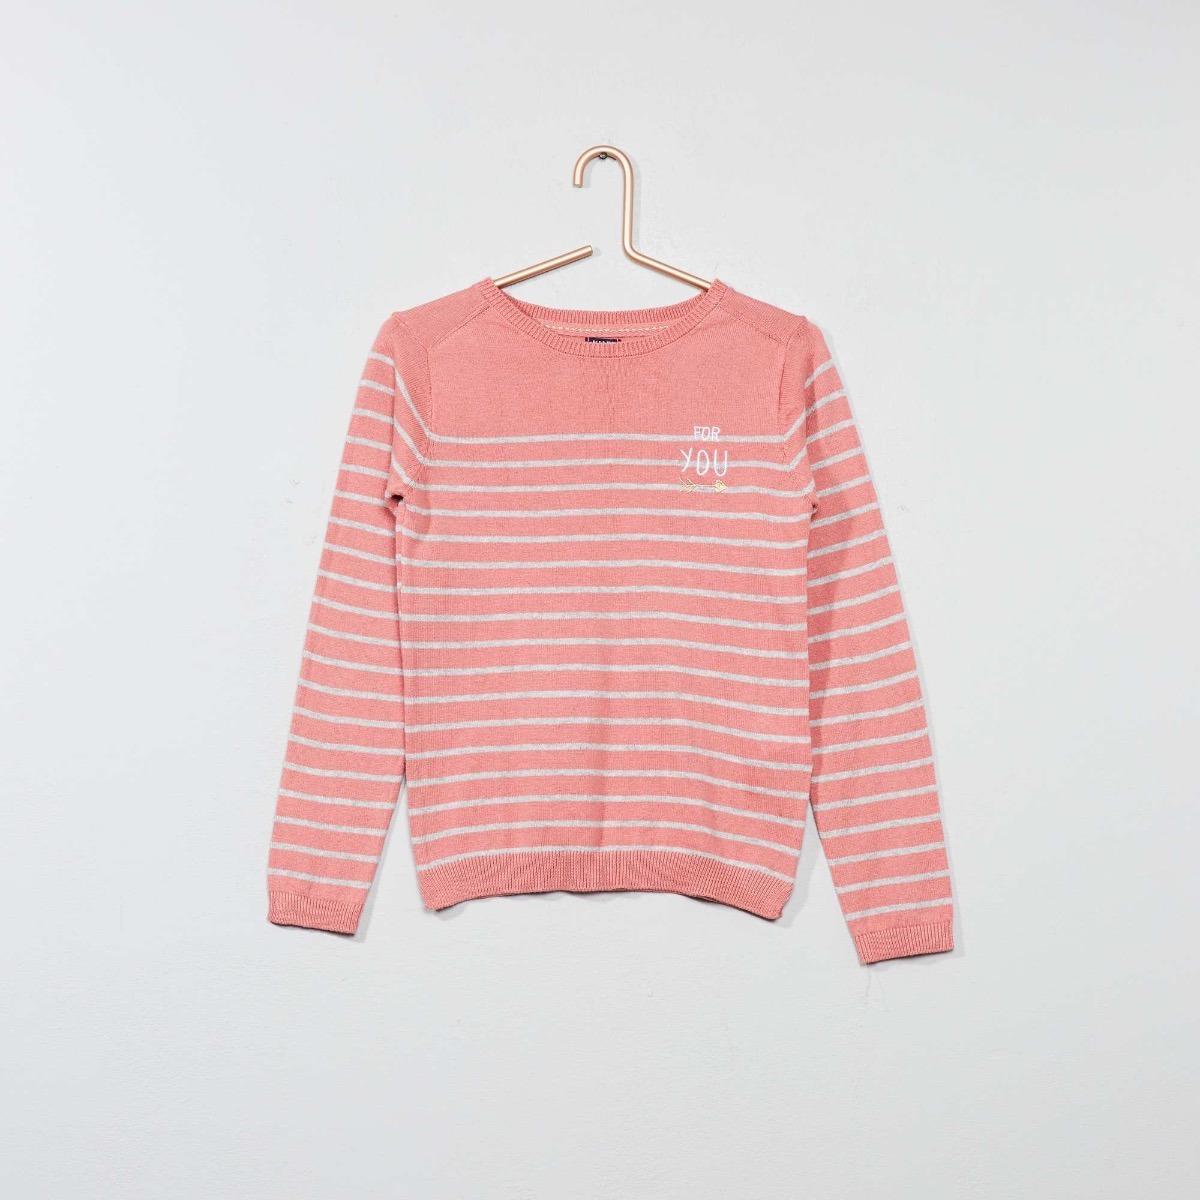 calidad superior comprar gran selección de Suéter Niña Importado Kiabi Talla 8